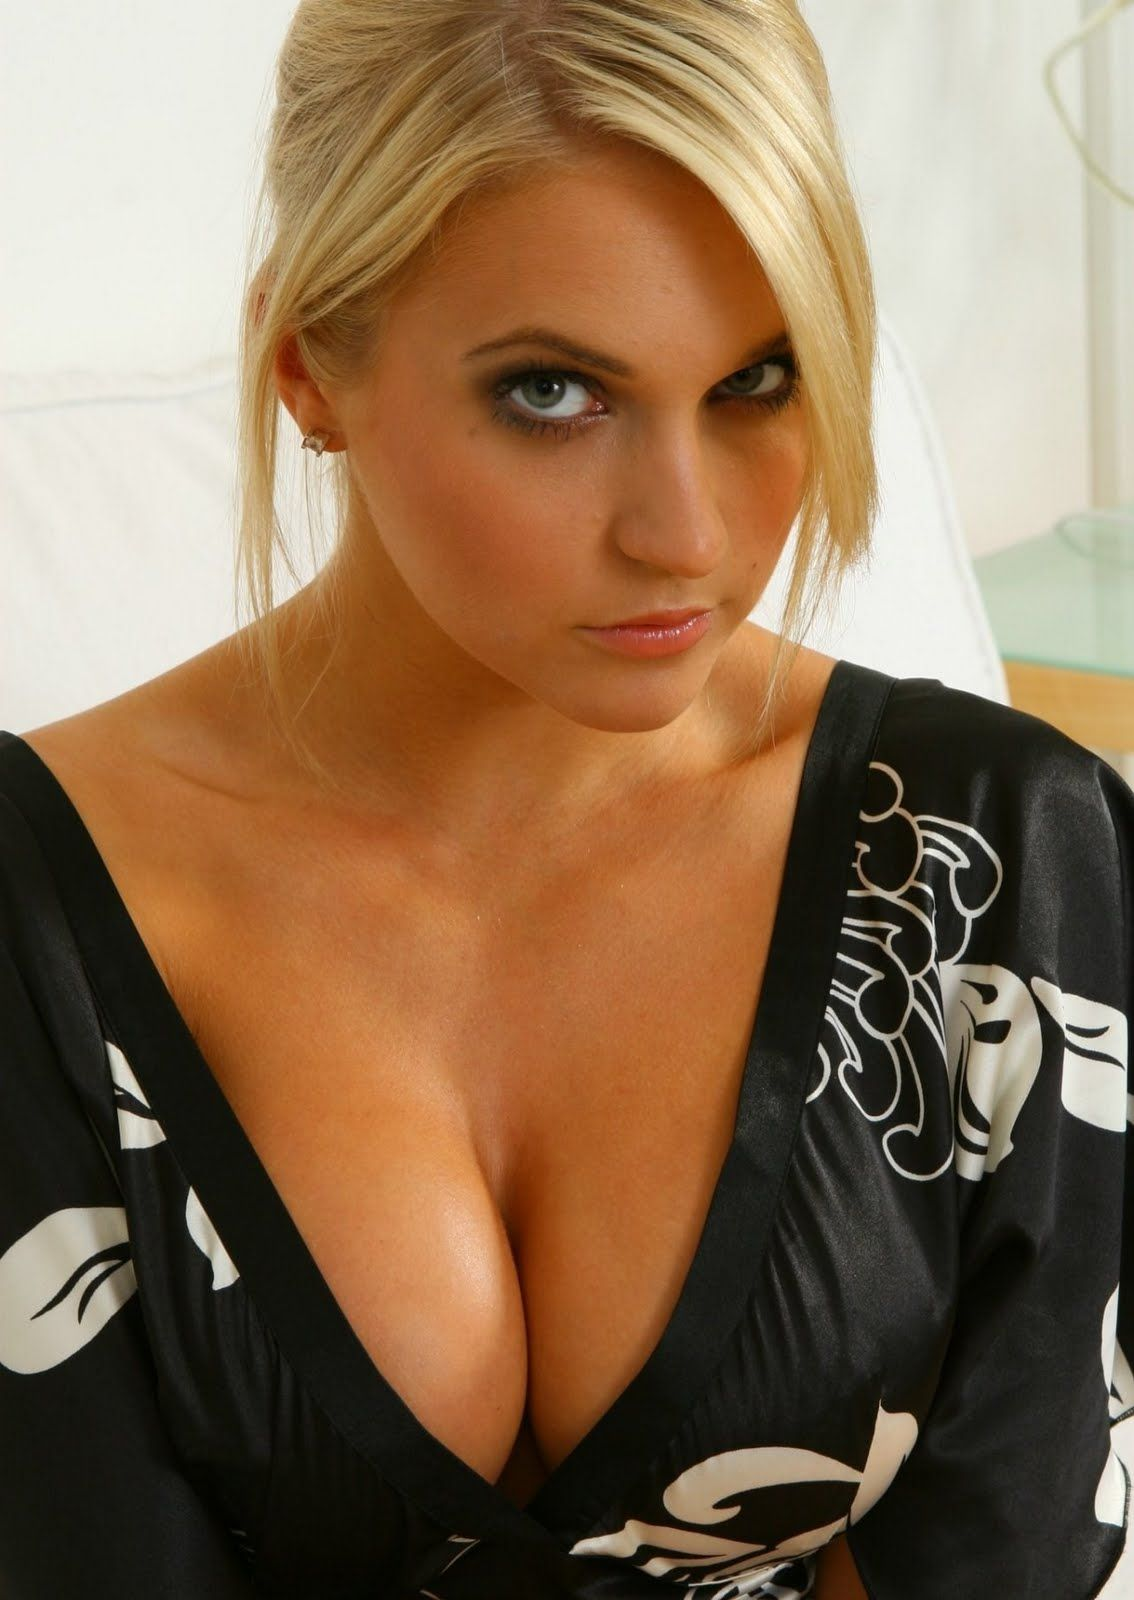 Kayleigh Pearson Sex Ele 47 best kayleigh pearson images on pinterest | celebrity pics